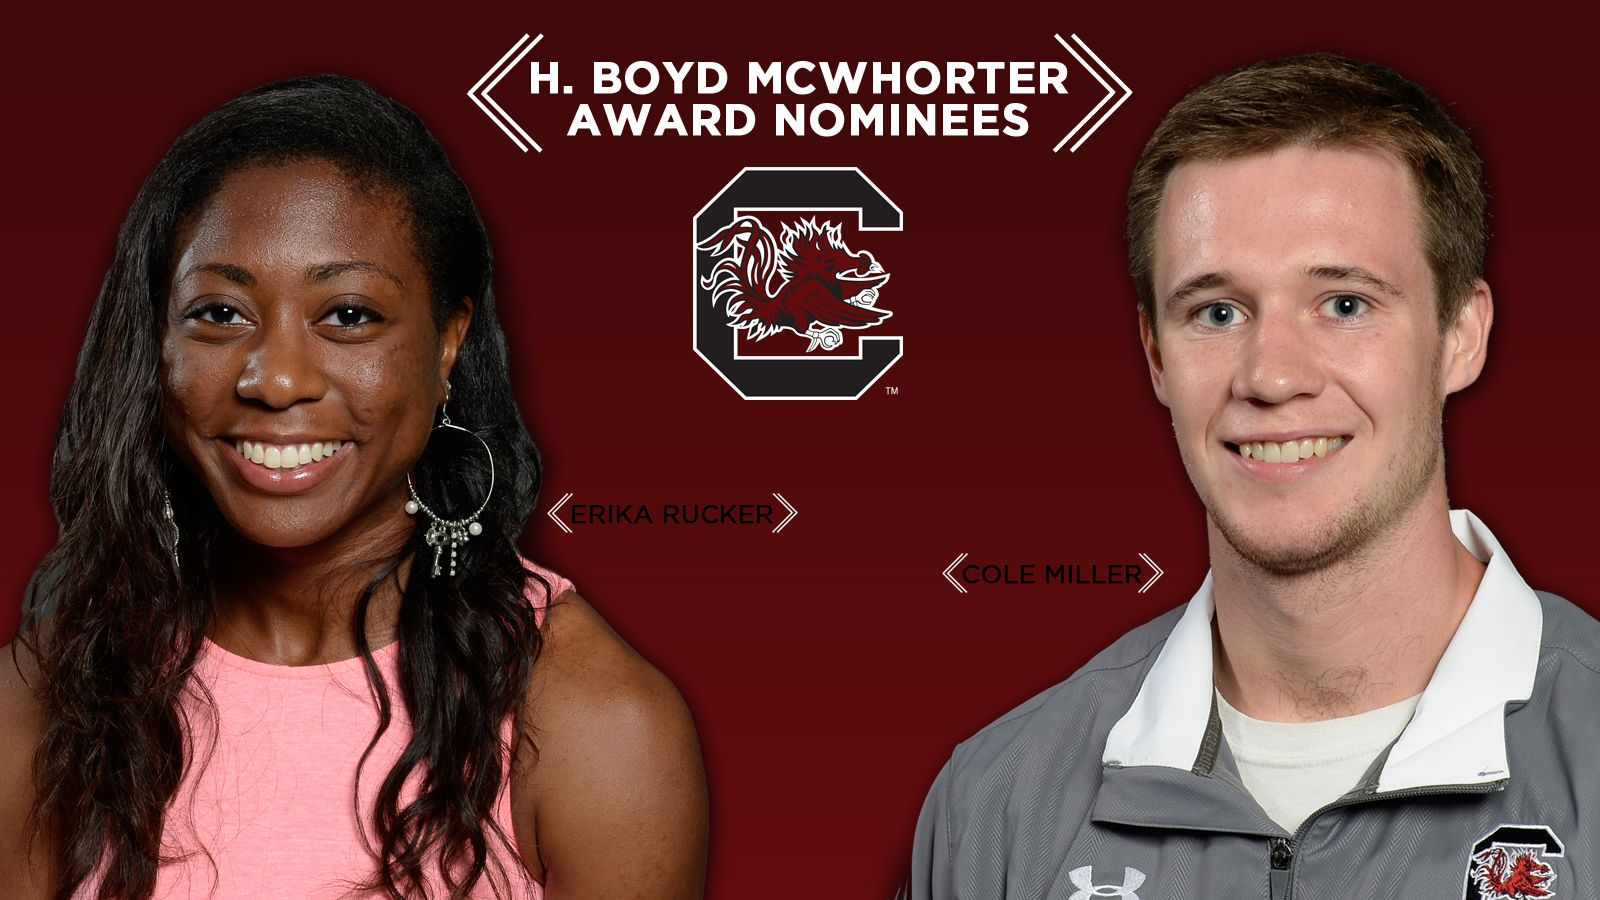 South Carolina McWhorter Award